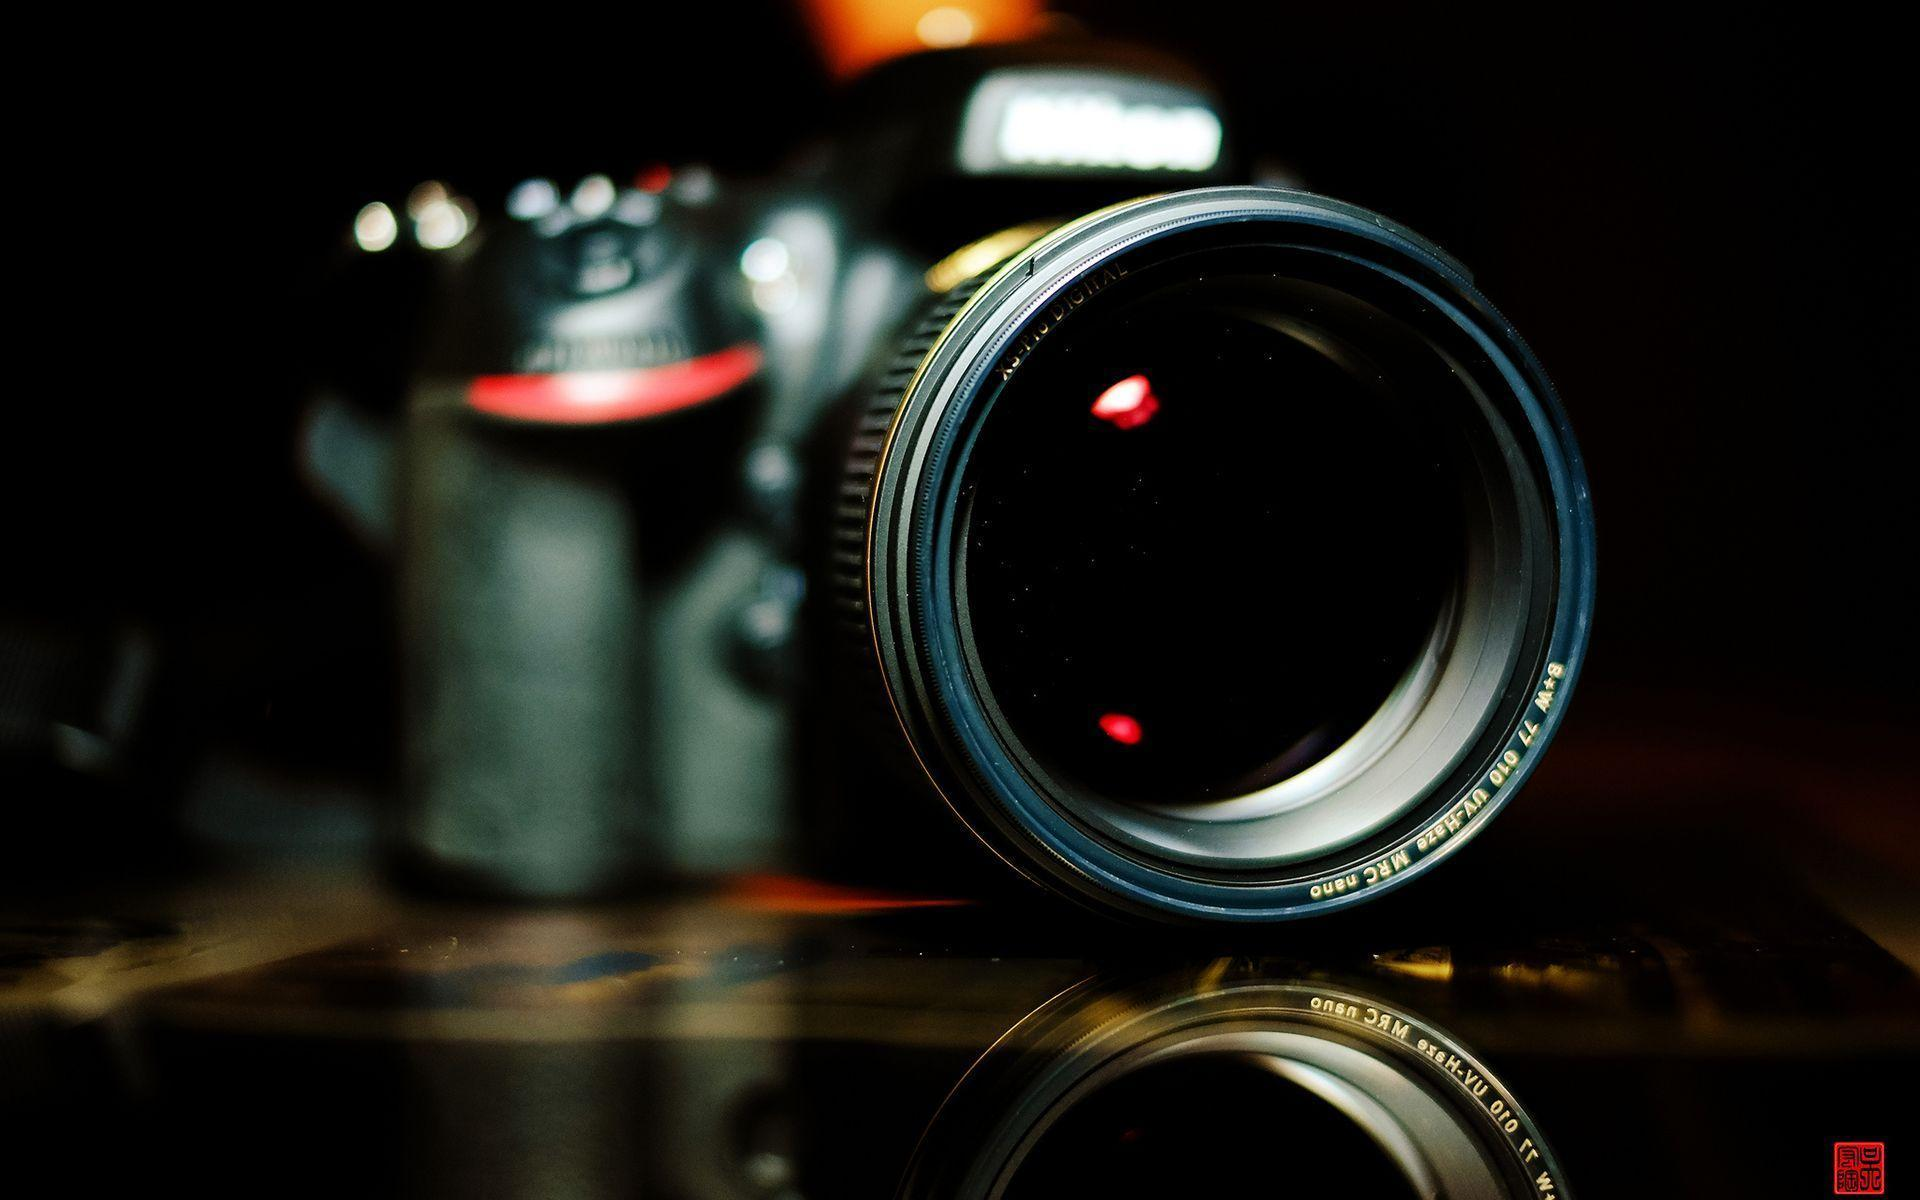 Camera Lens Wallpapers Desktop : Other Wallpaper - Arunnath.com